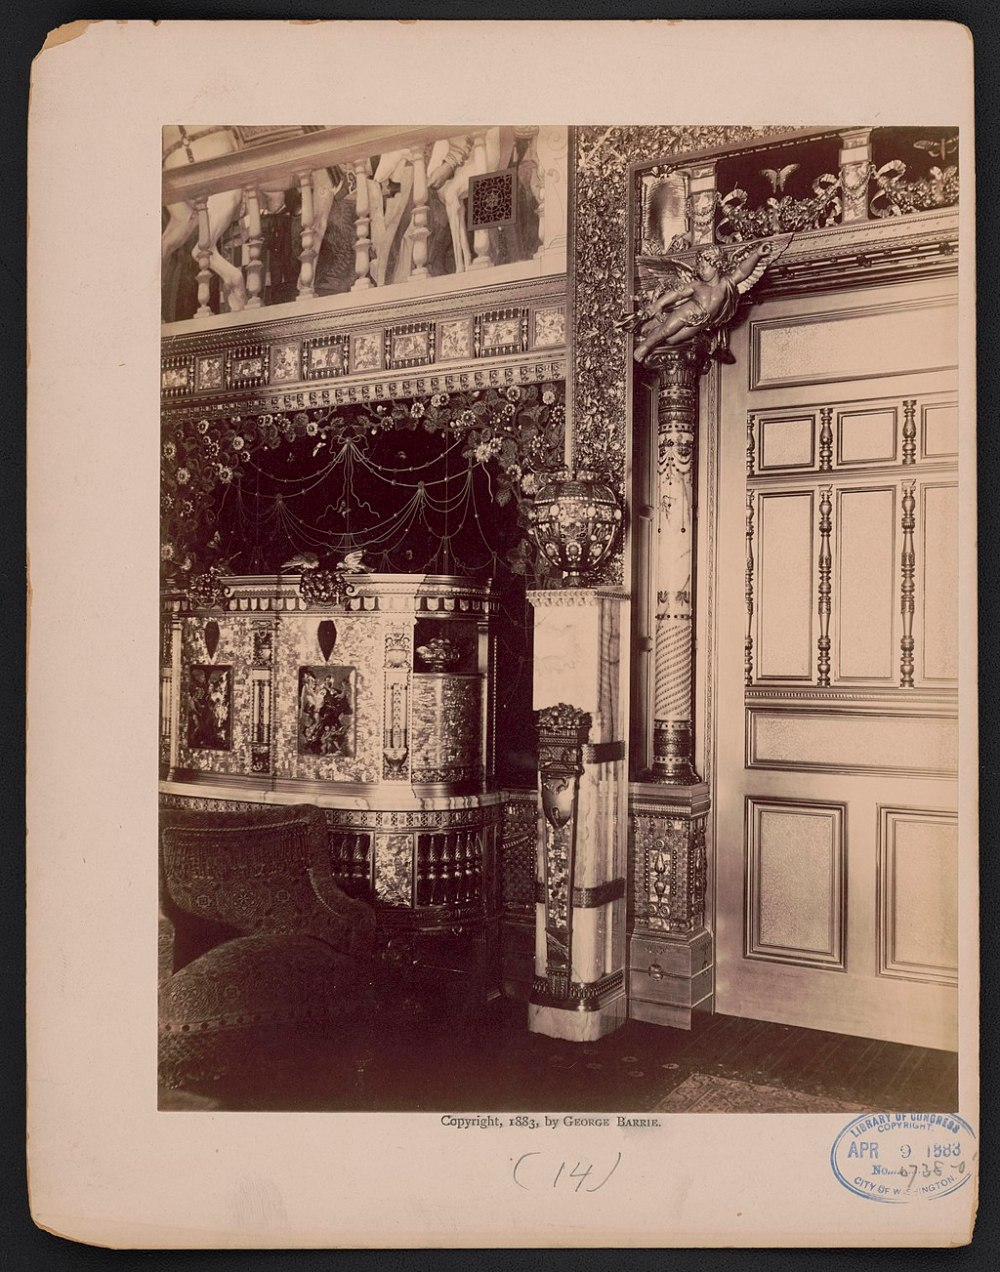 William K. and Alva Vanderbilt mansion, 660 Fifth Avenue, New York City. Interior details